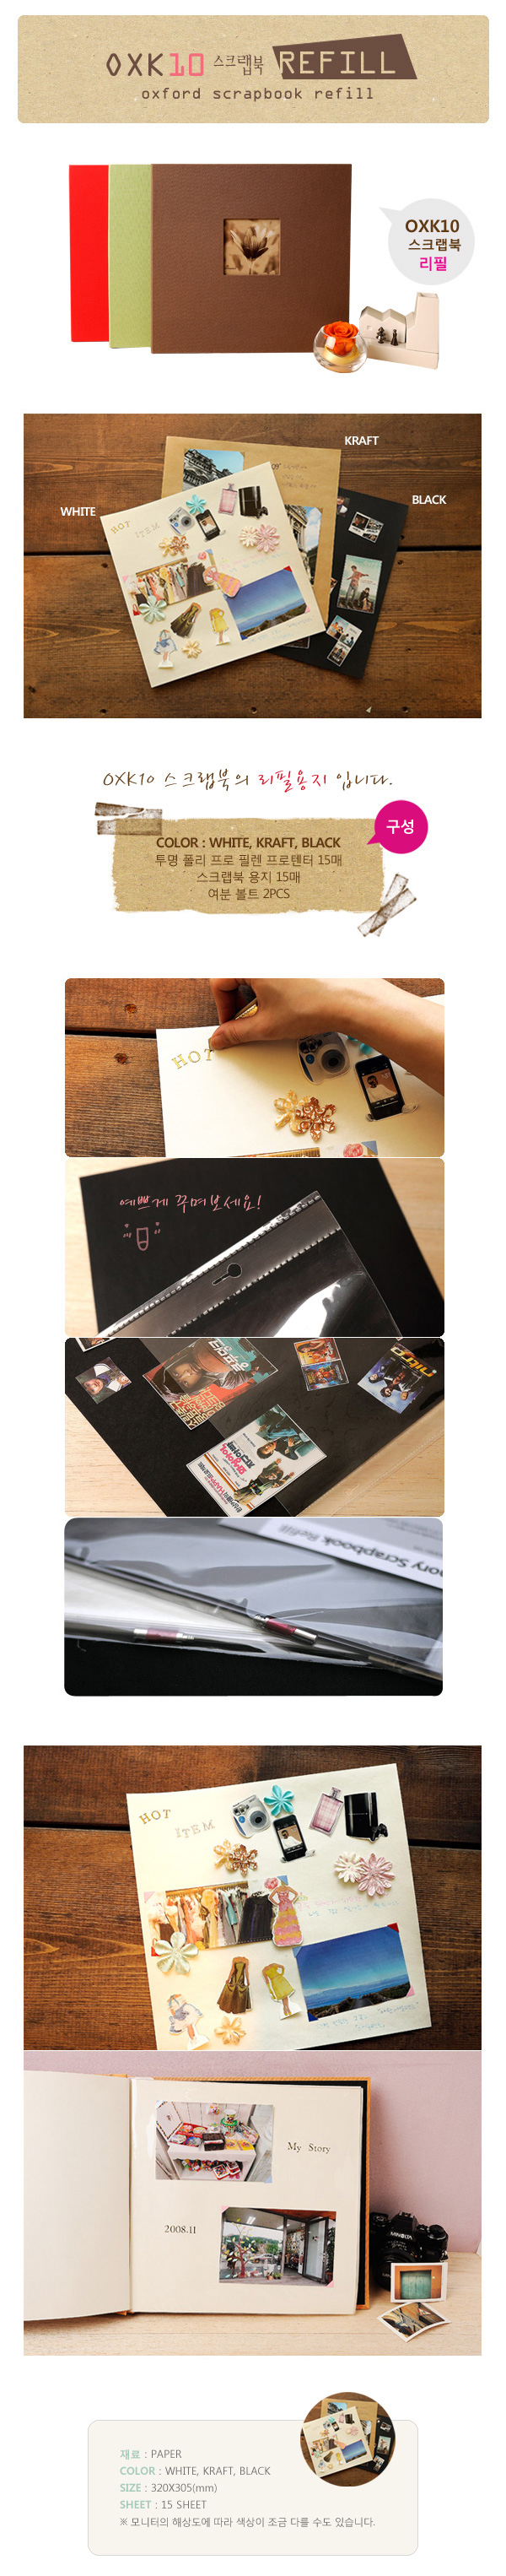 OXK 10 REFILL - 코즈모갤러리, 12,000원, 테마앨범/테마북, 바인더북